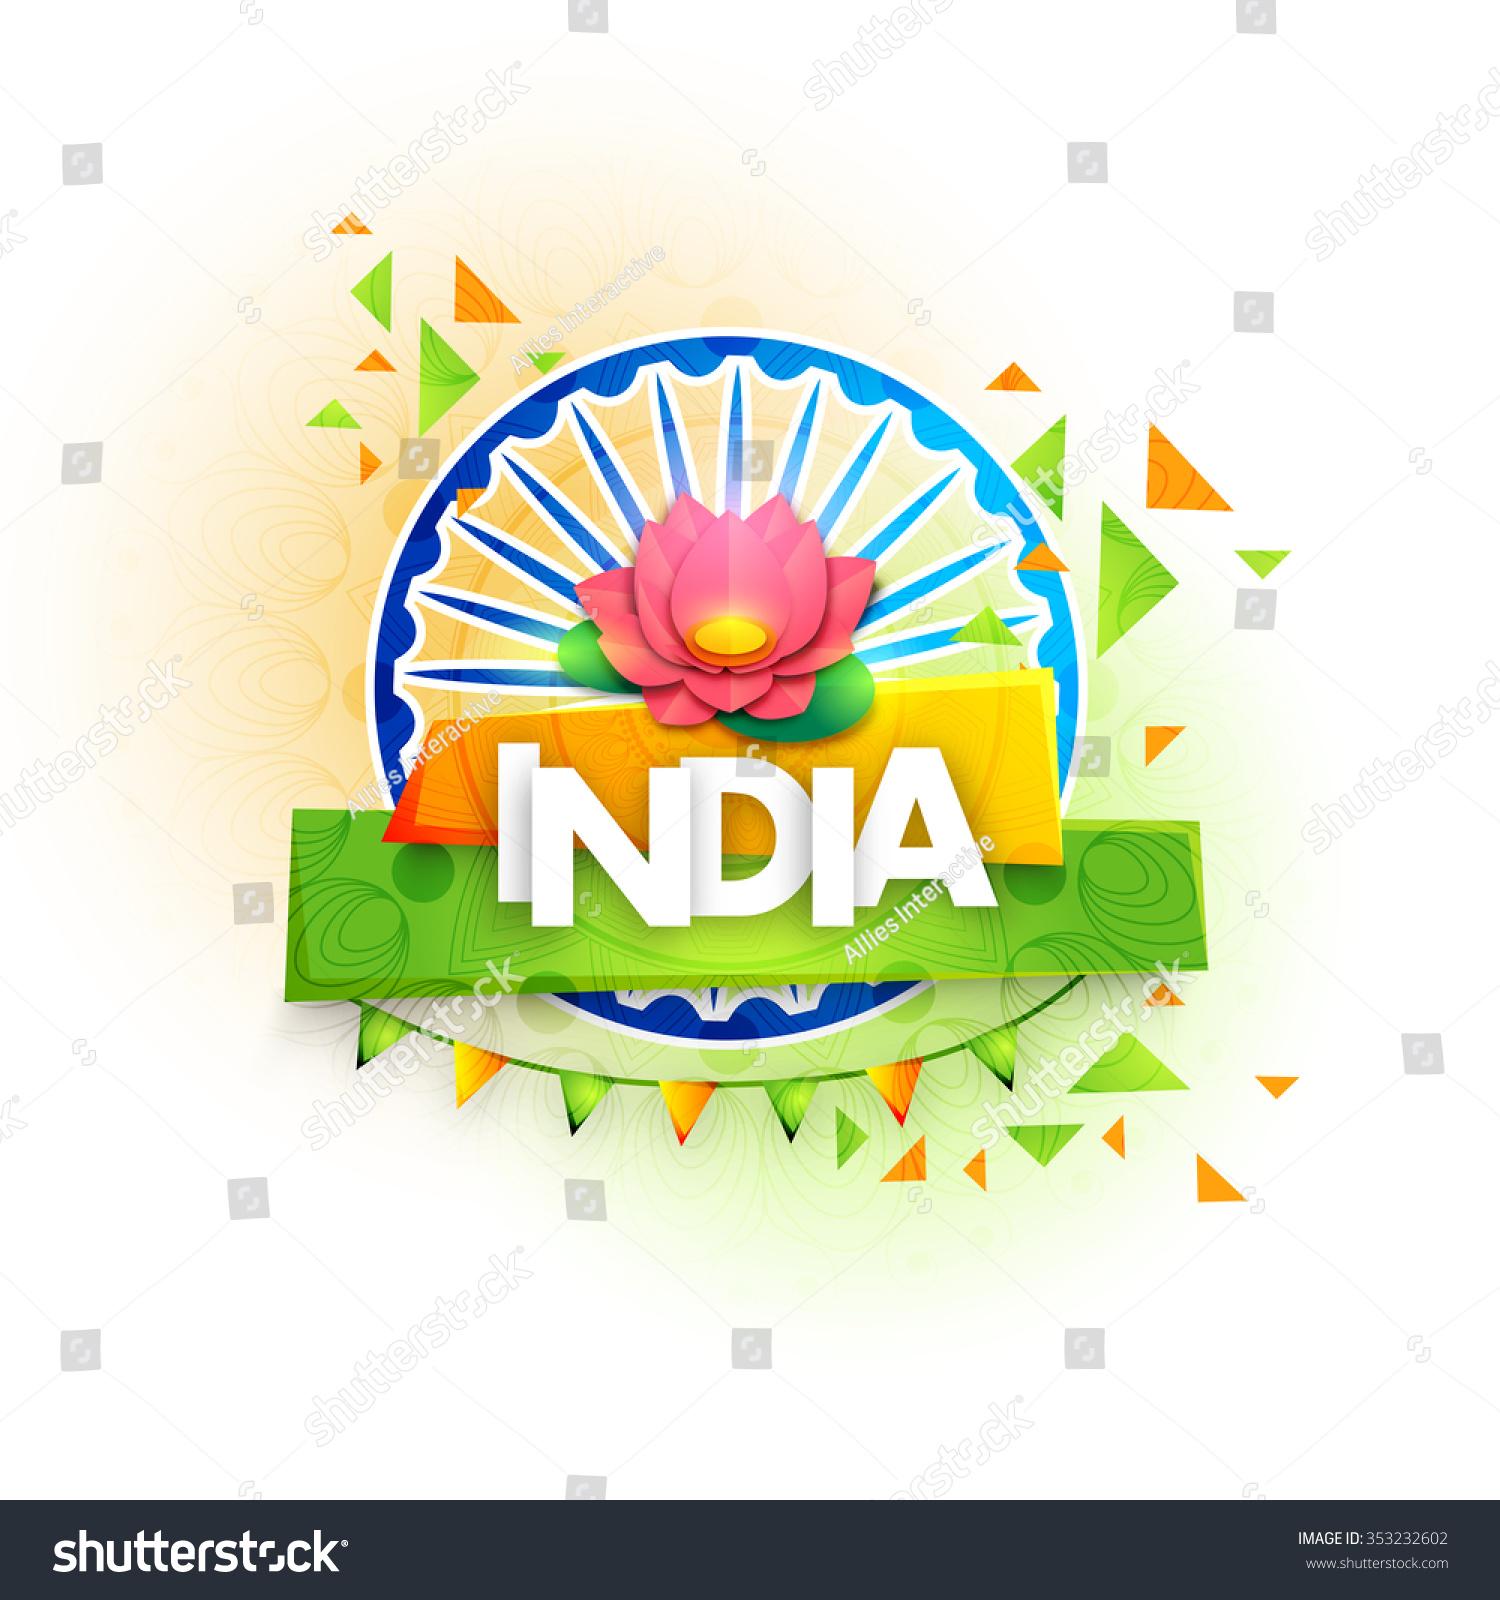 Indian national flower lotus ashoka wheel stock vector royalty free indian national flower lotus with ashoka wheel on shiny background for happy republic day celebration izmirmasajfo